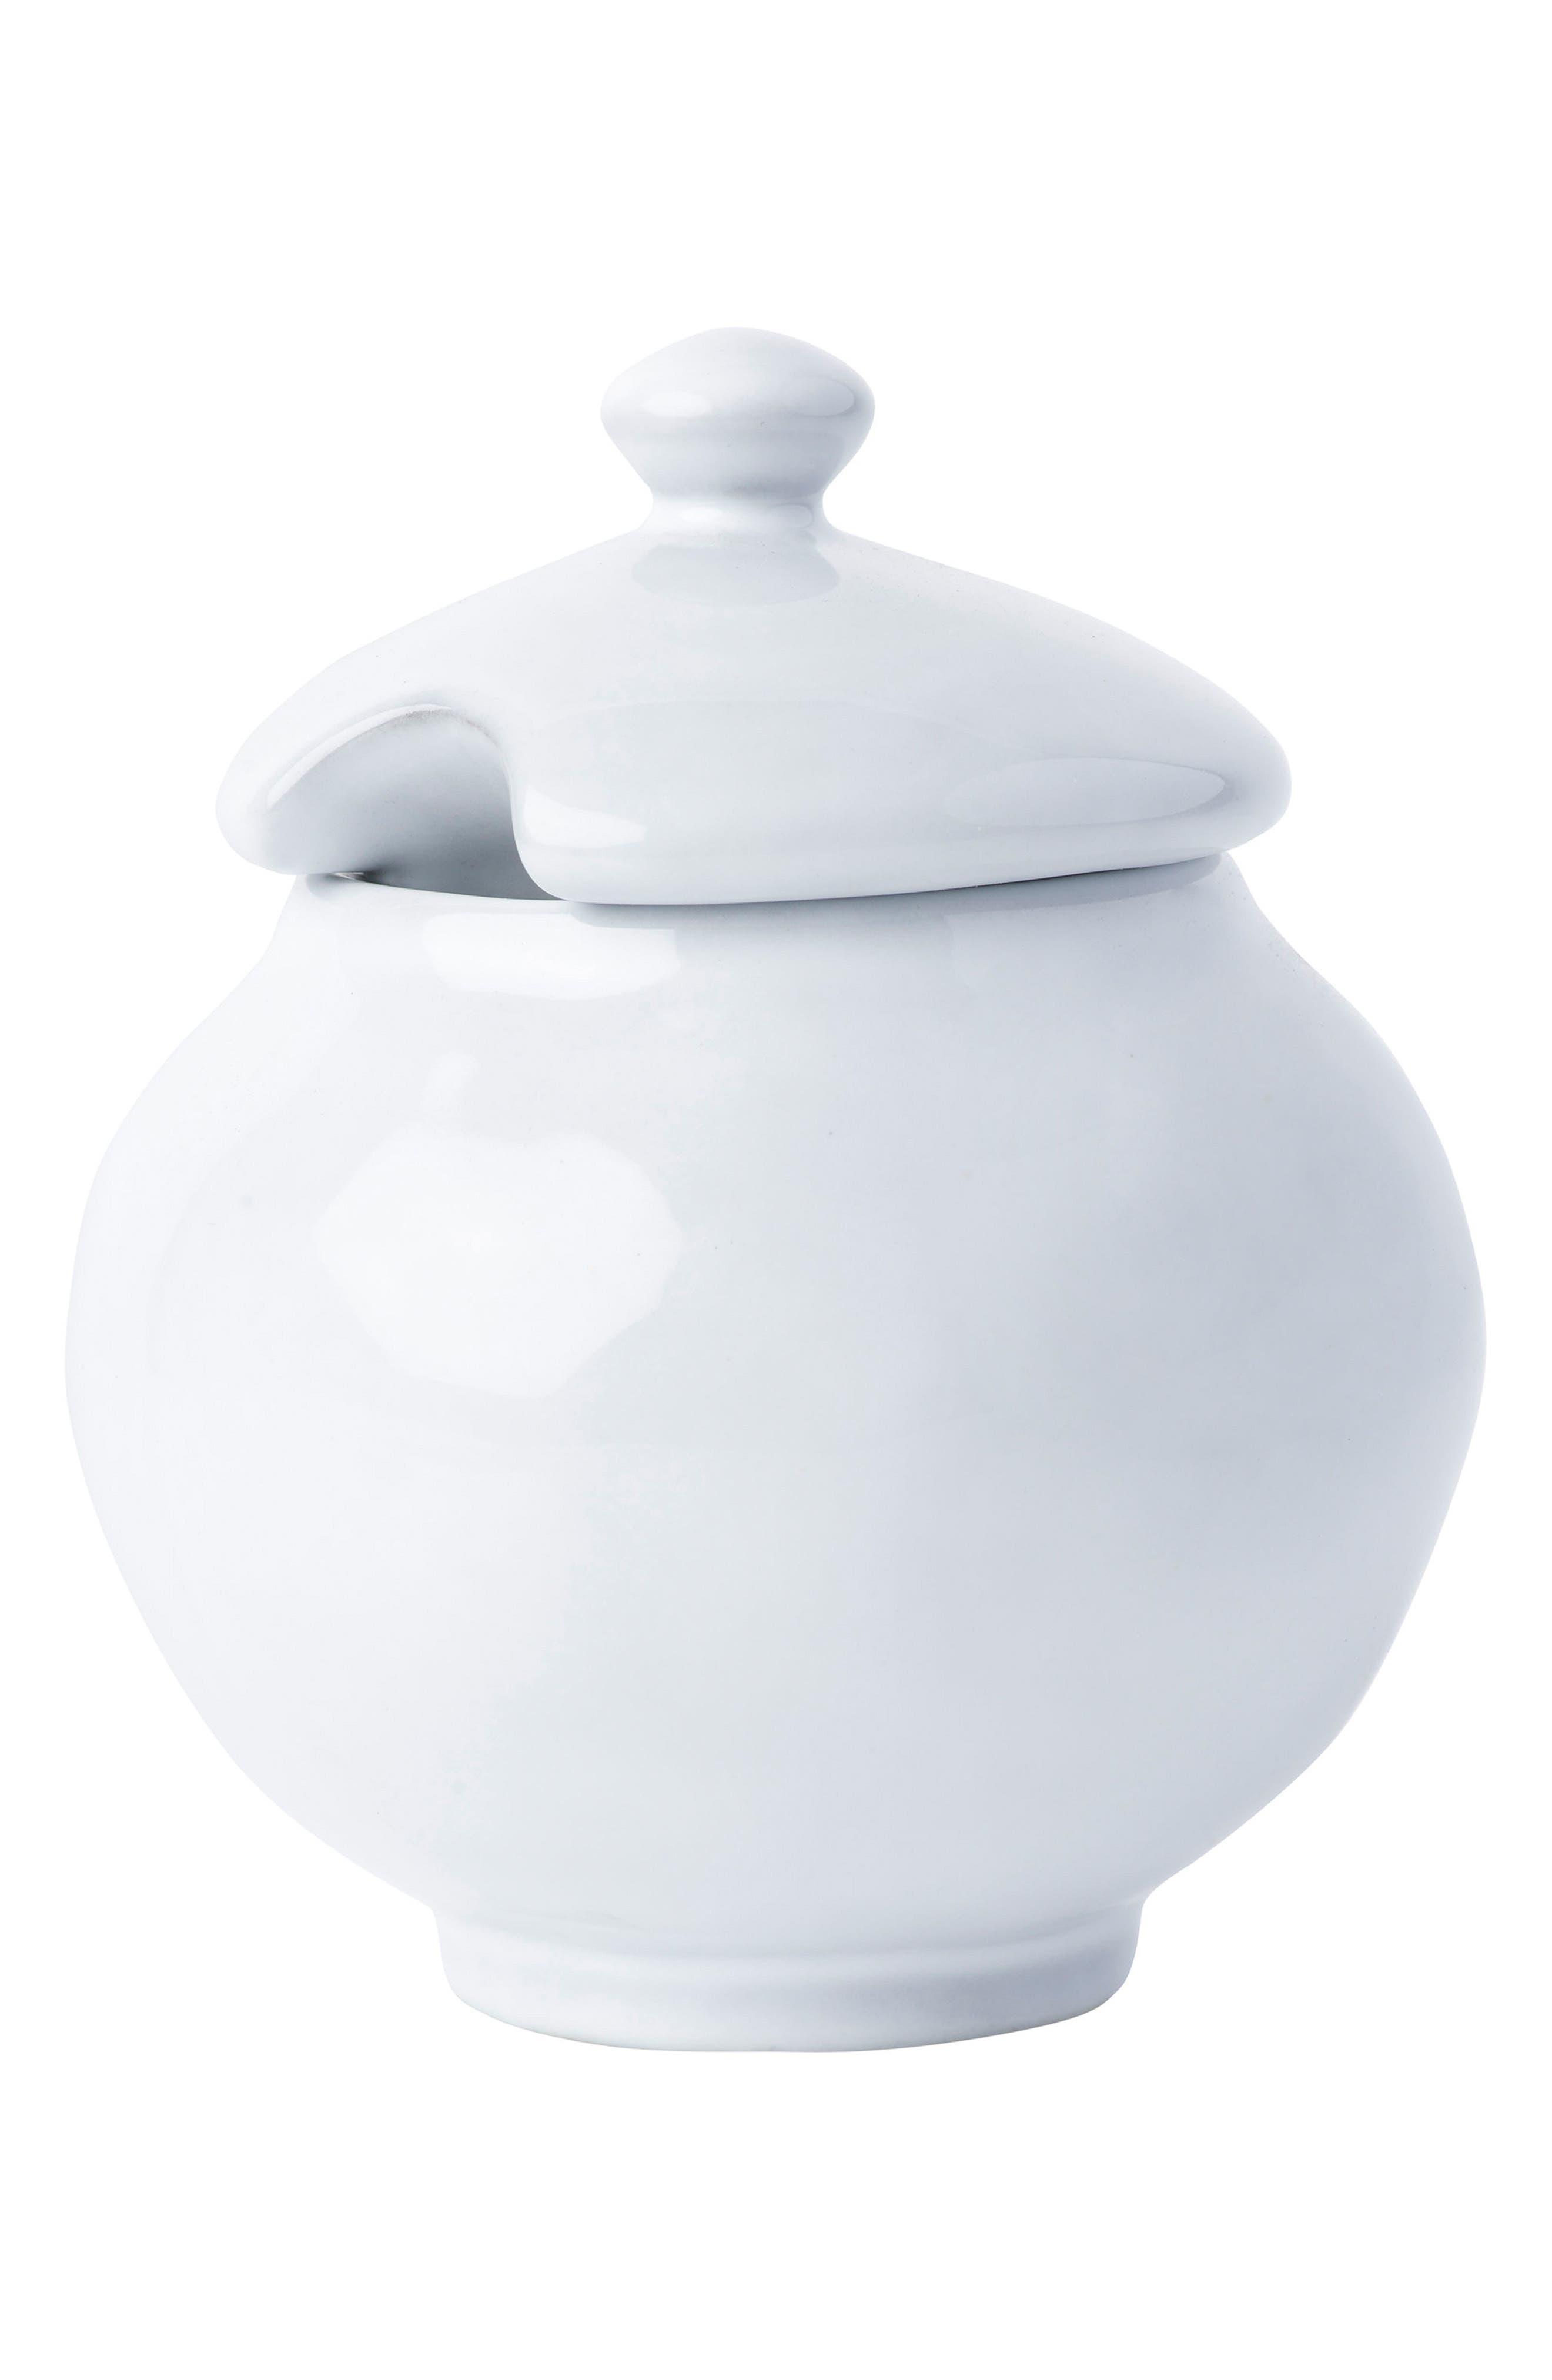 Main Image - Juliska Quotidien White Truffle Ceramic Sugar Bowl